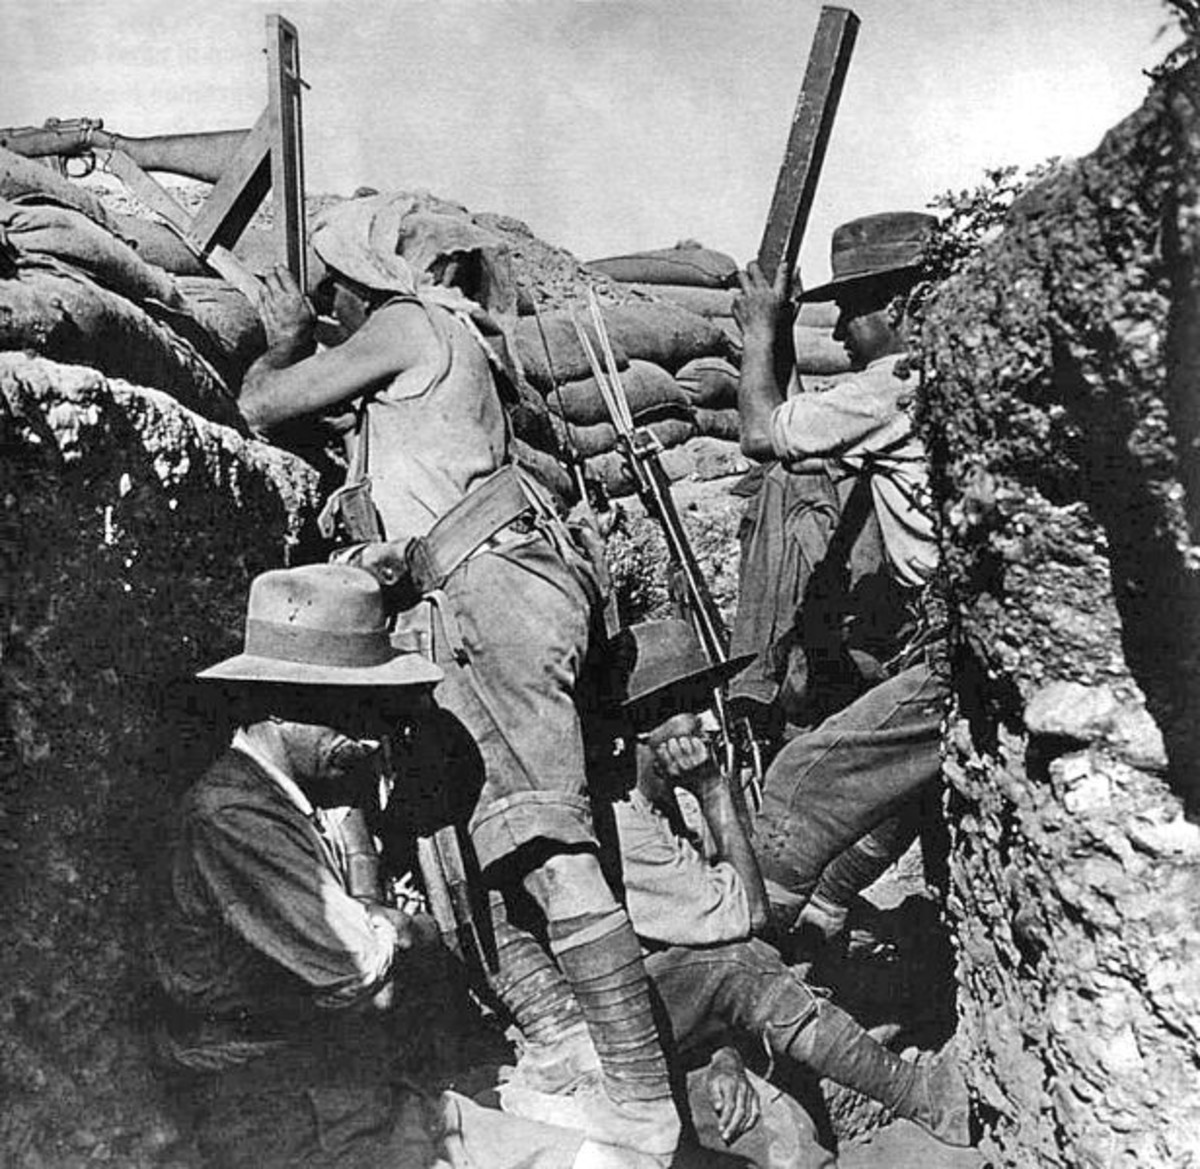 Australian using a periscope rifle at Gallipoli, 1915.